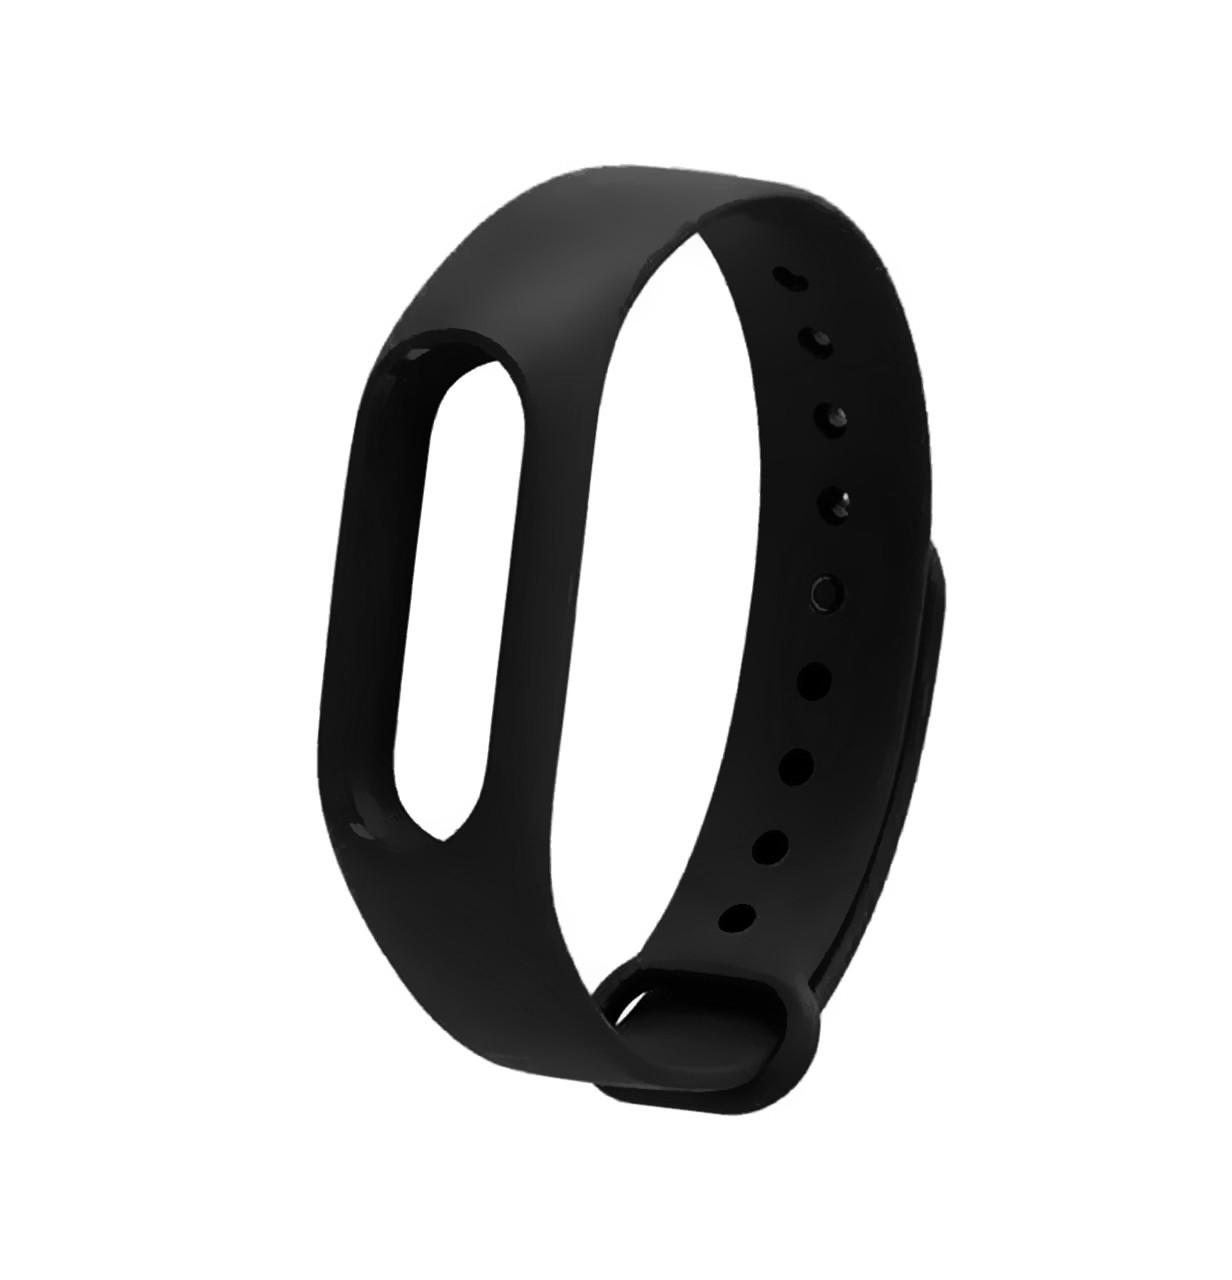 Ремешок Silicone для фитнес-браслета Xiaomi Mi Band 2 Black